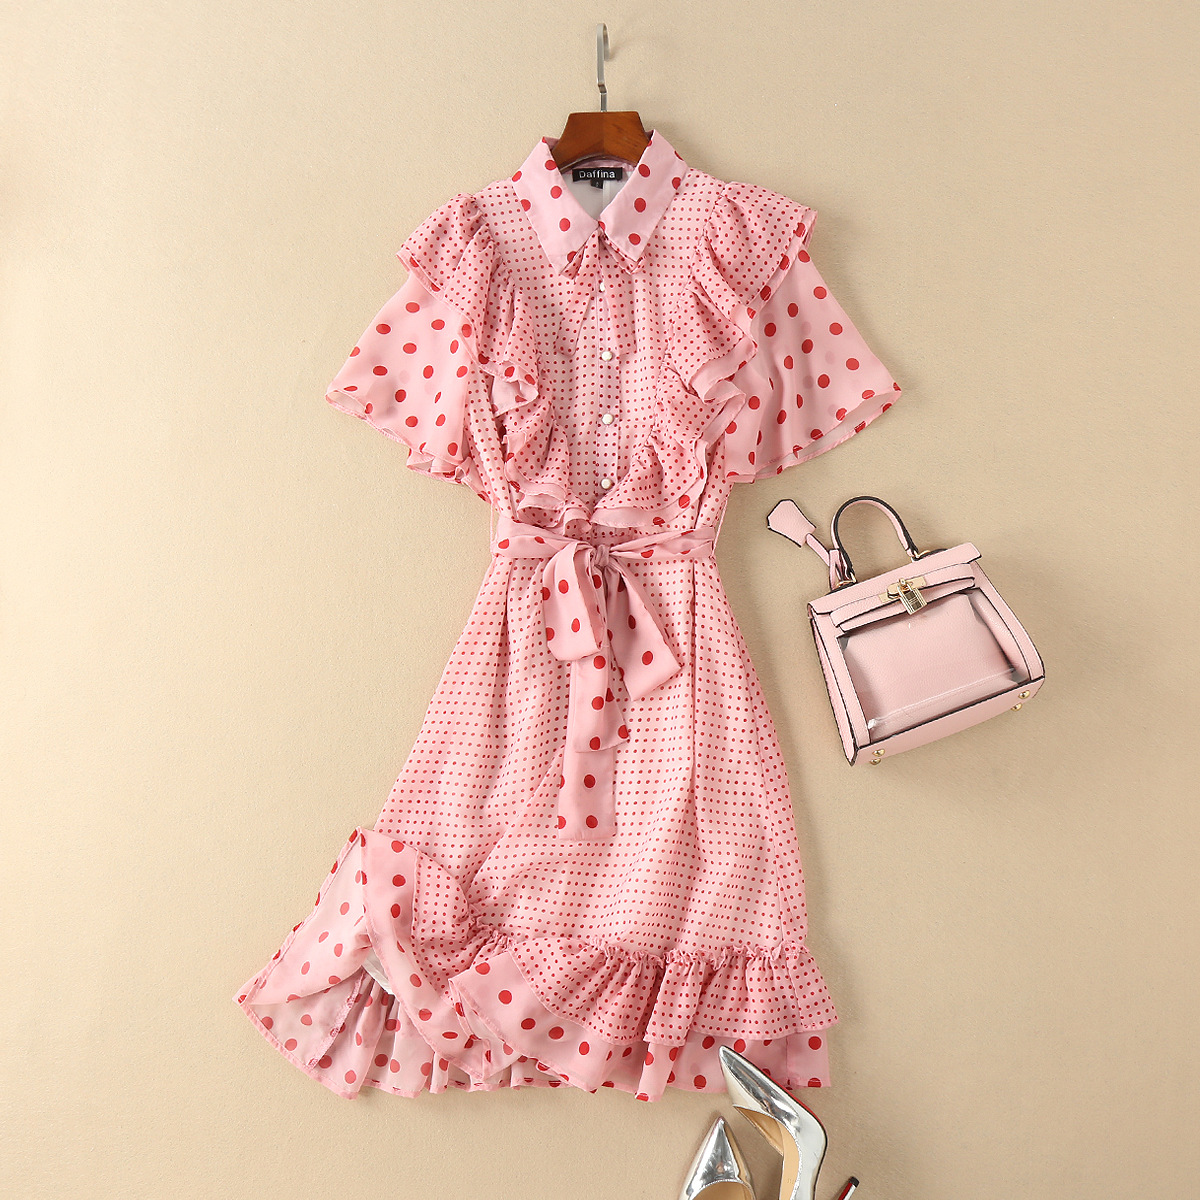 Sweet pink polka dots print chiffon shirt dress ruffles front button-up cute sexy mermaid dresses new 2018 summer fashion